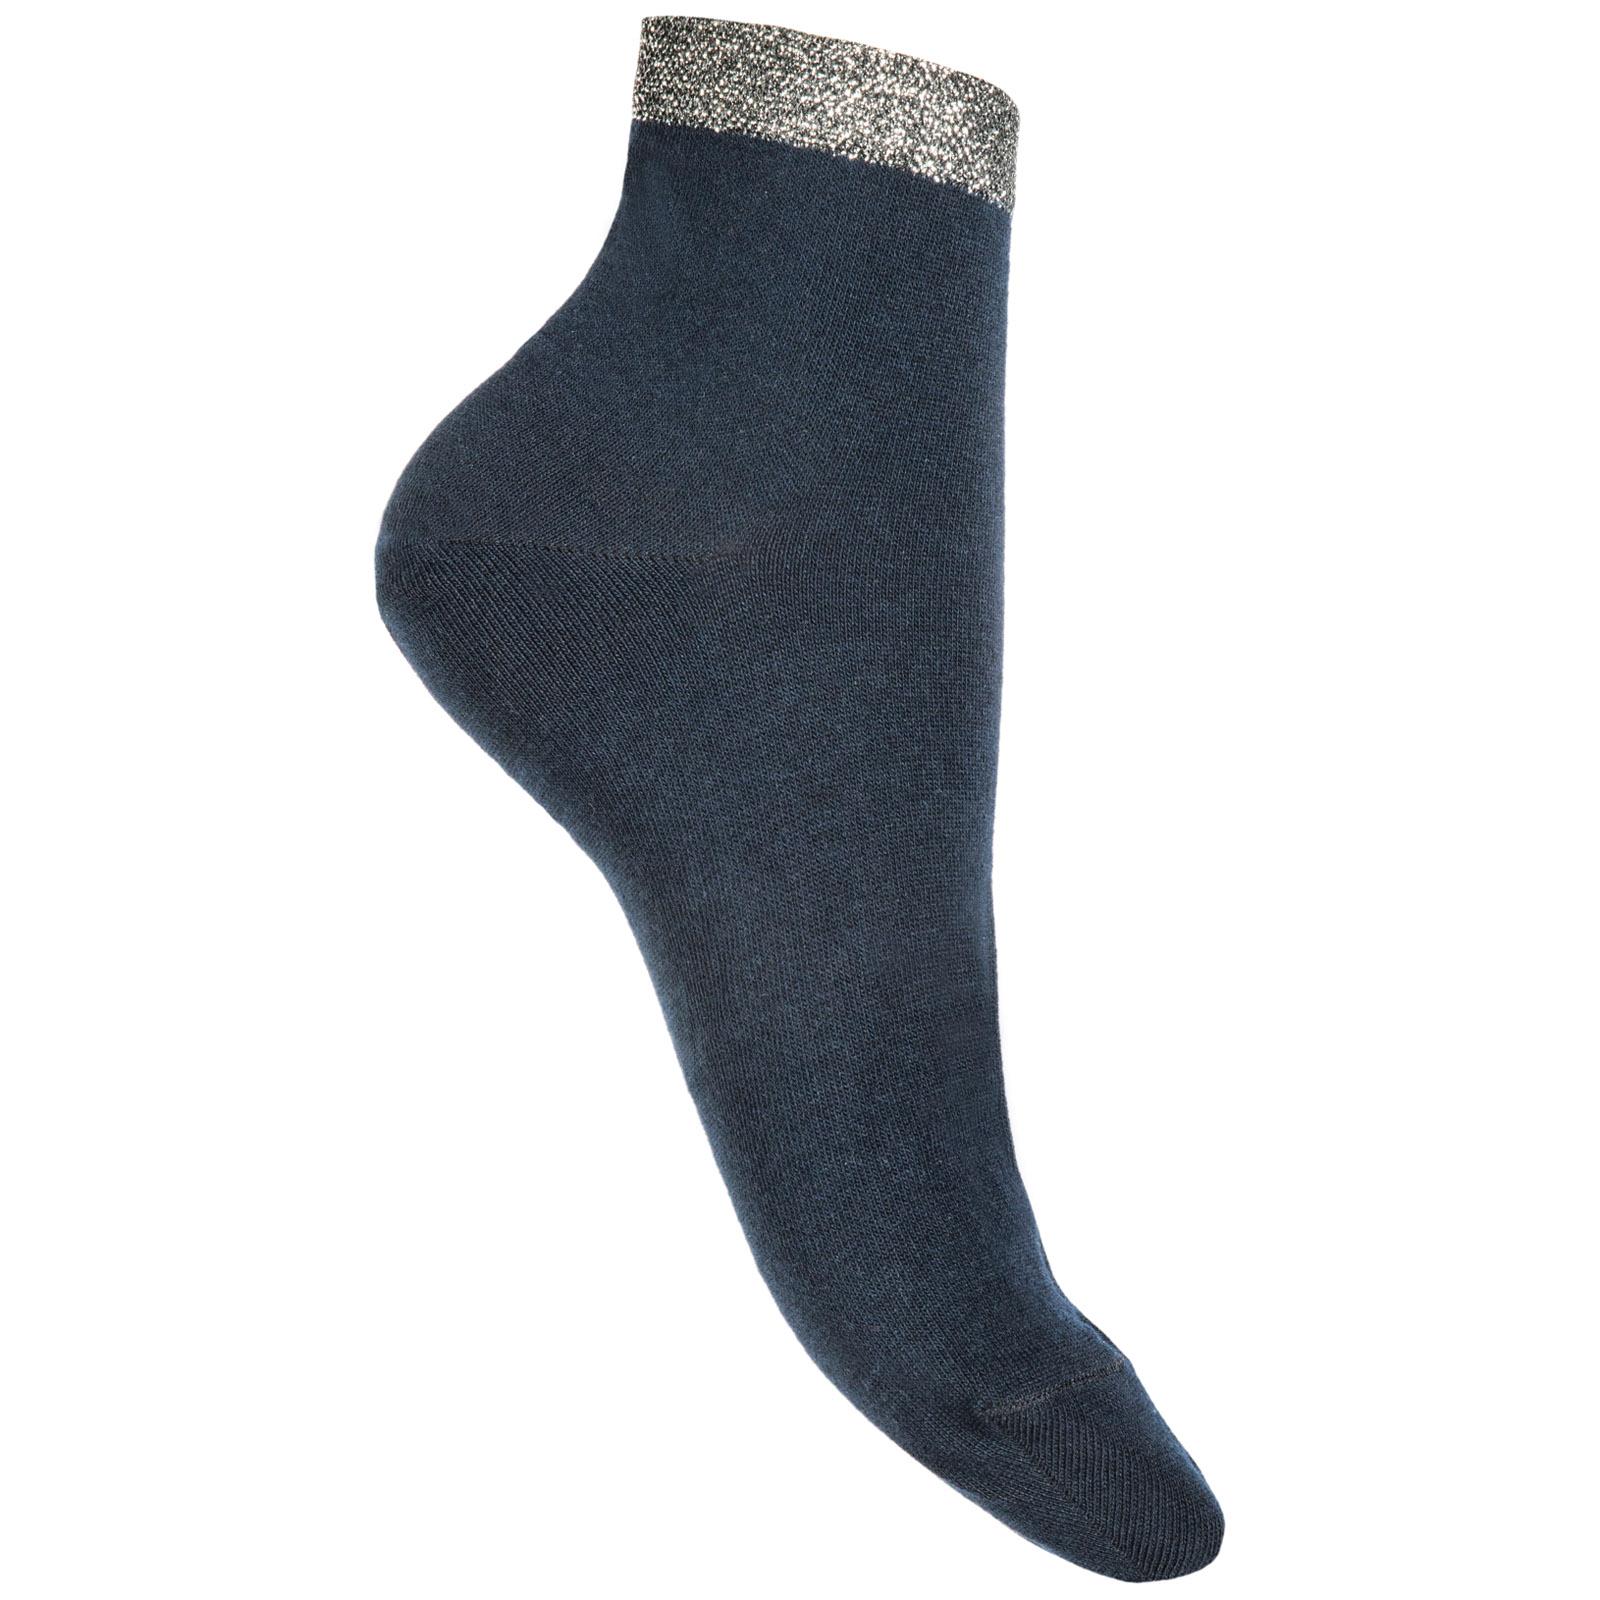 Ankle socks woman polsino silver